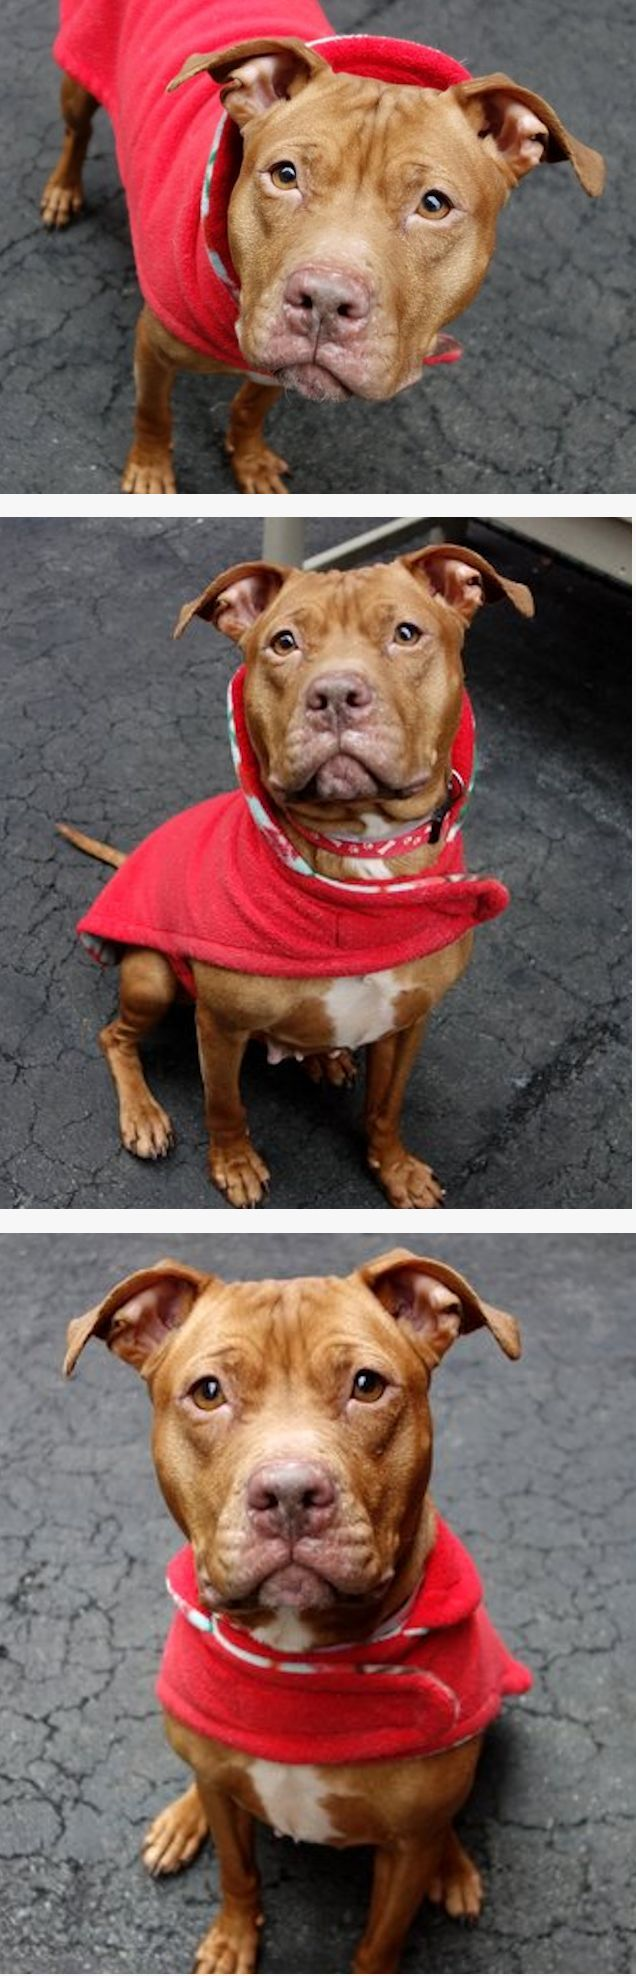 Best Sensibilisationpitbull Images On Pinterest Dogs - 26 dogs puppyhood photos